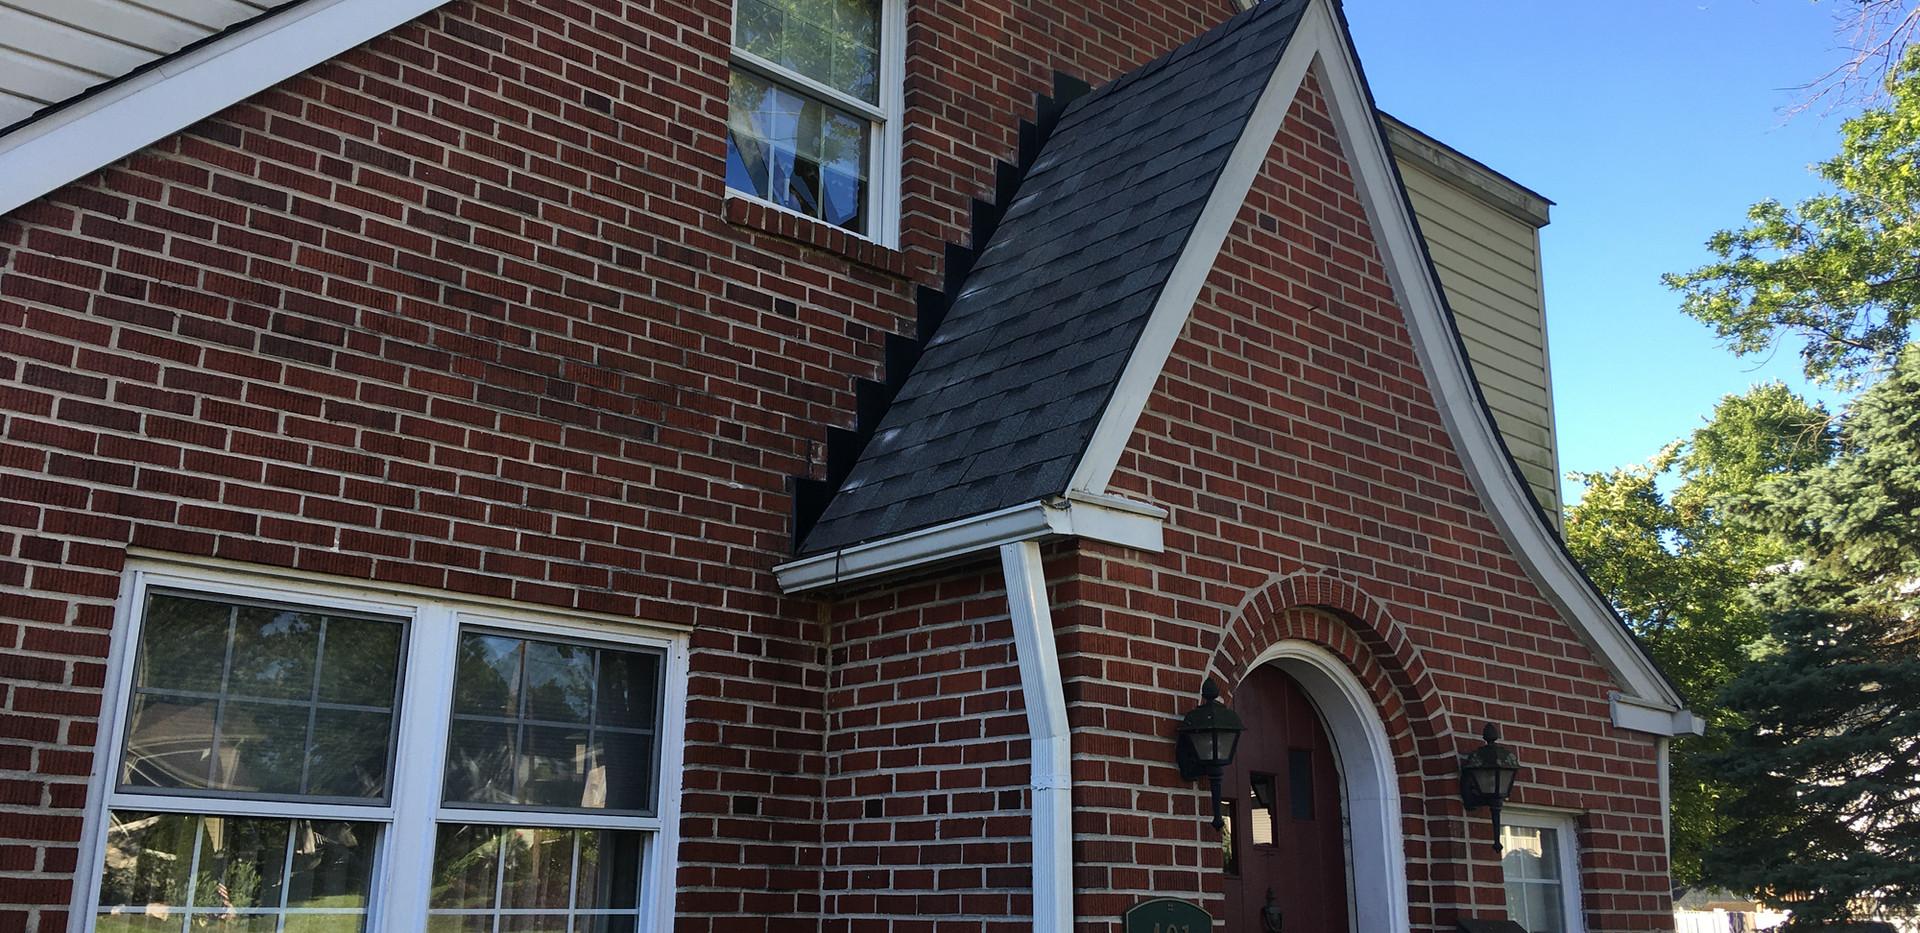 Wallingford, PA - New roof and wall repair / siding installation